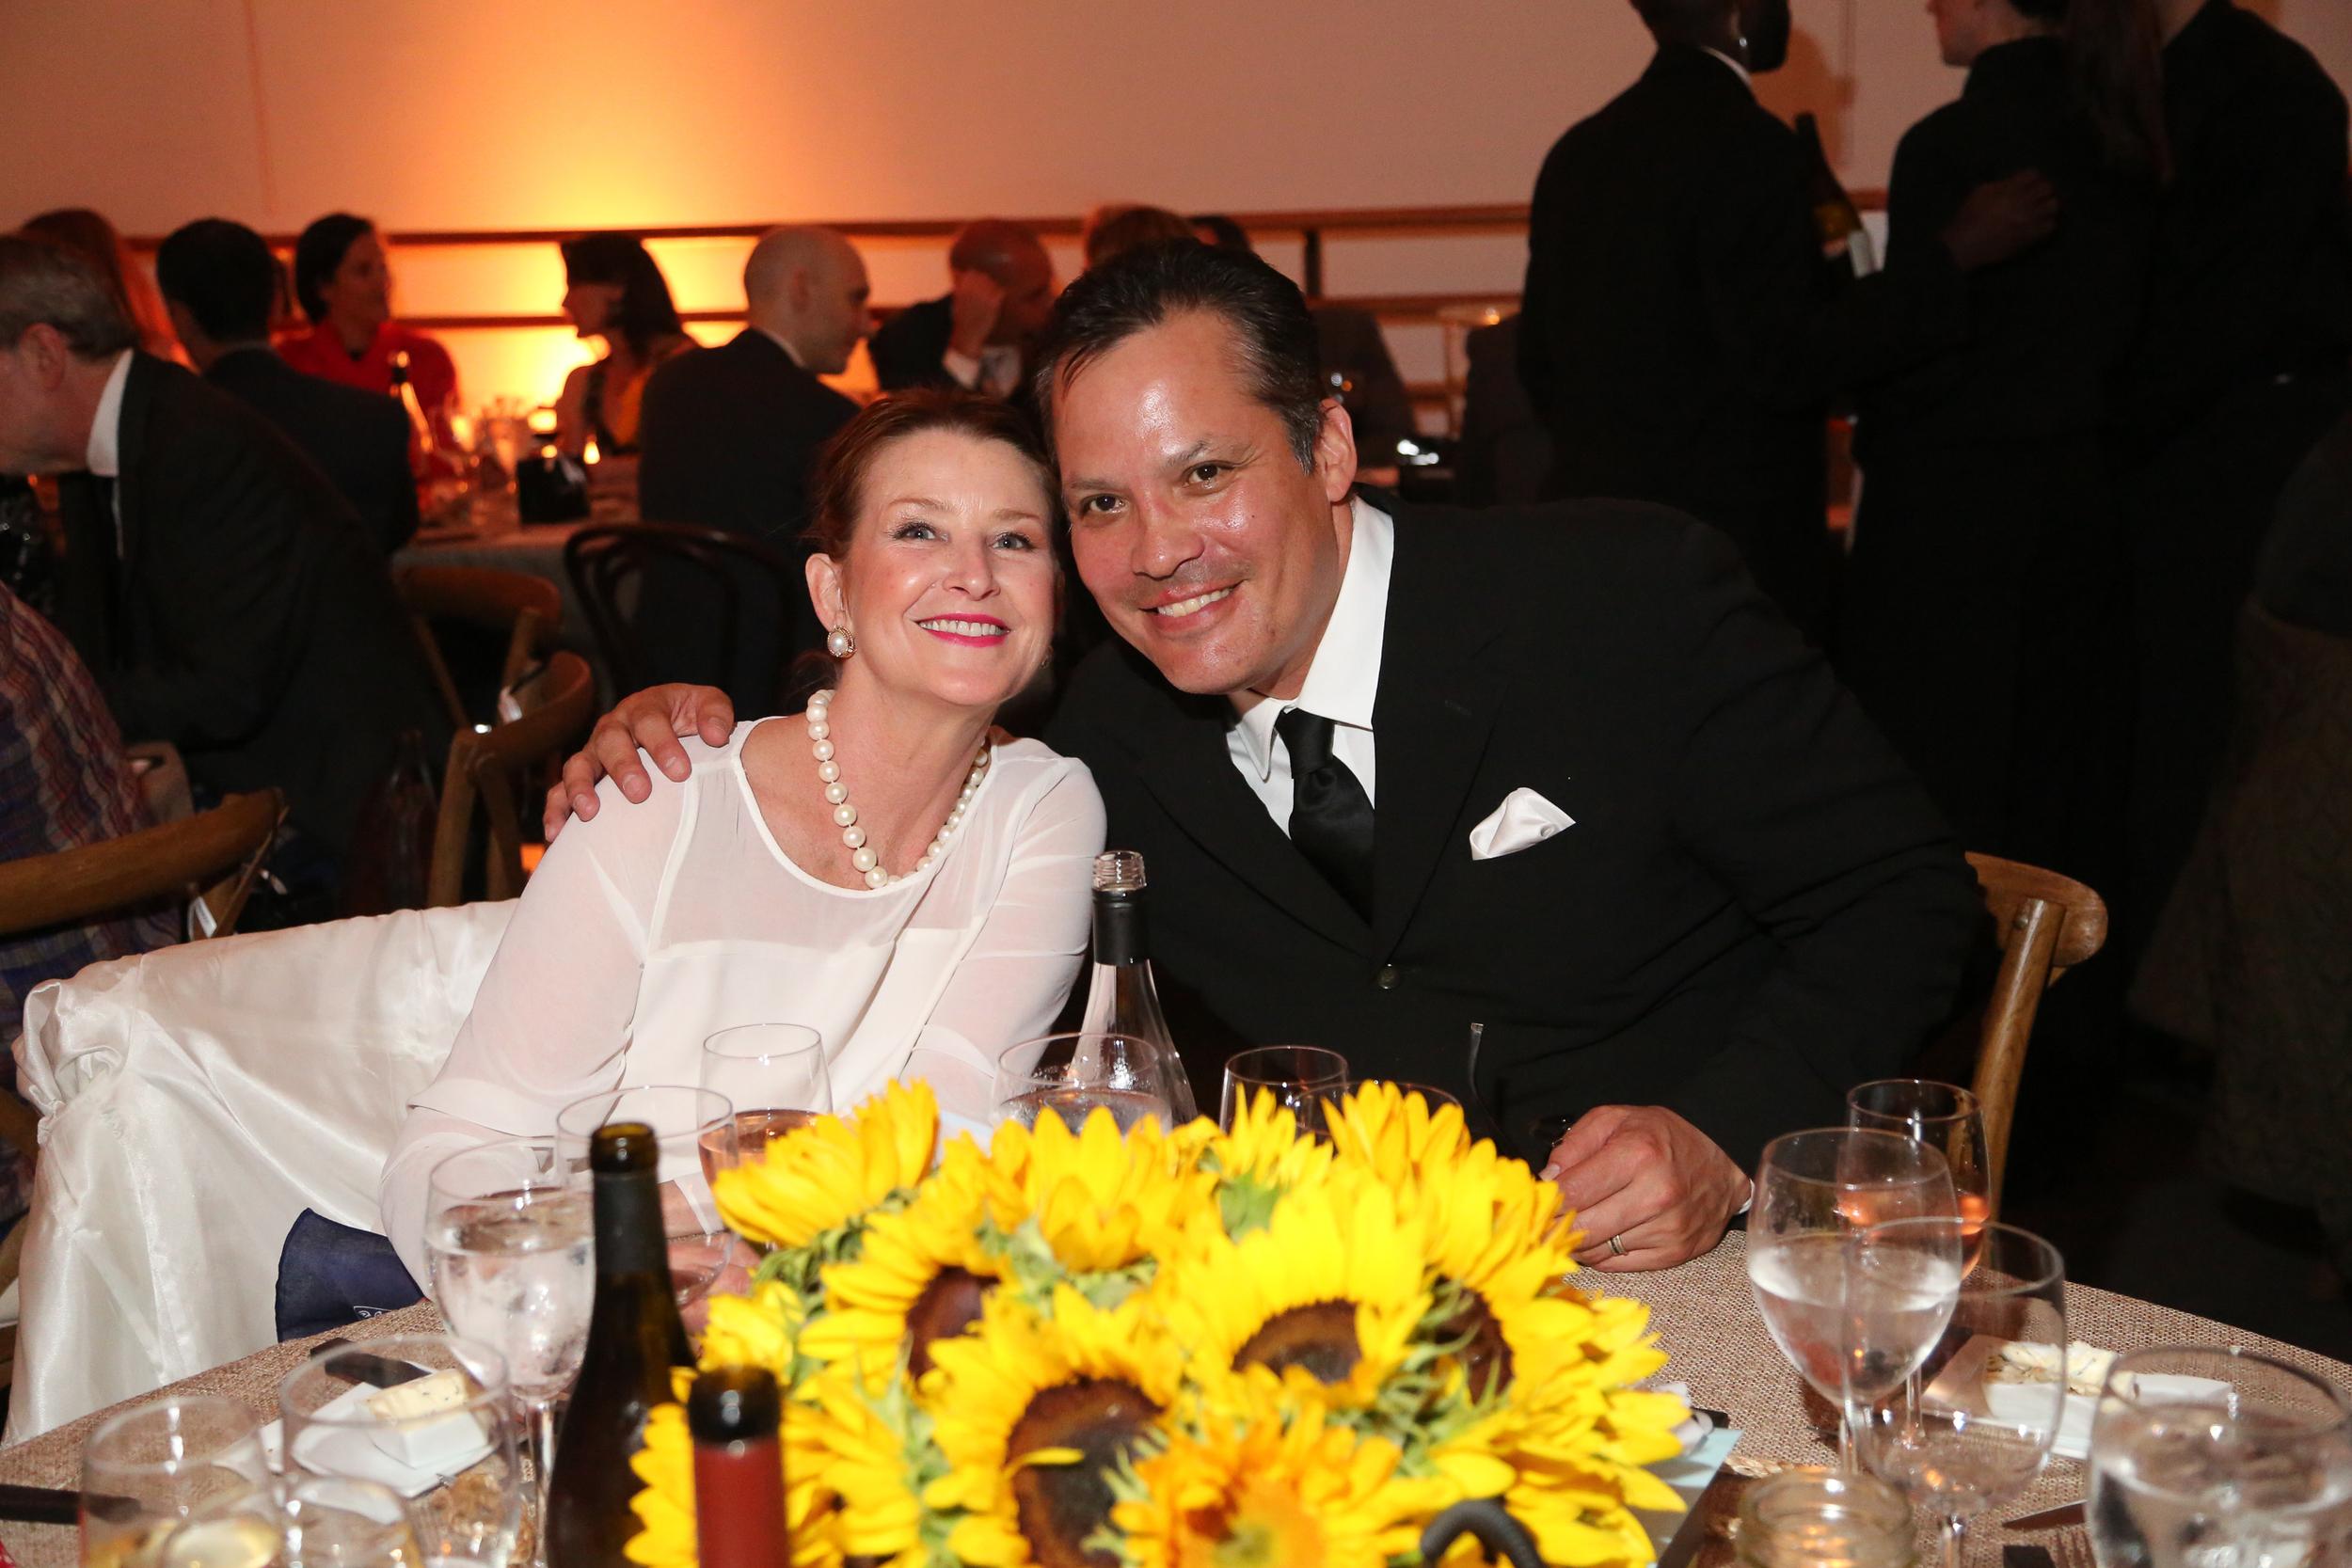 Darci Kistler and Jock Soto